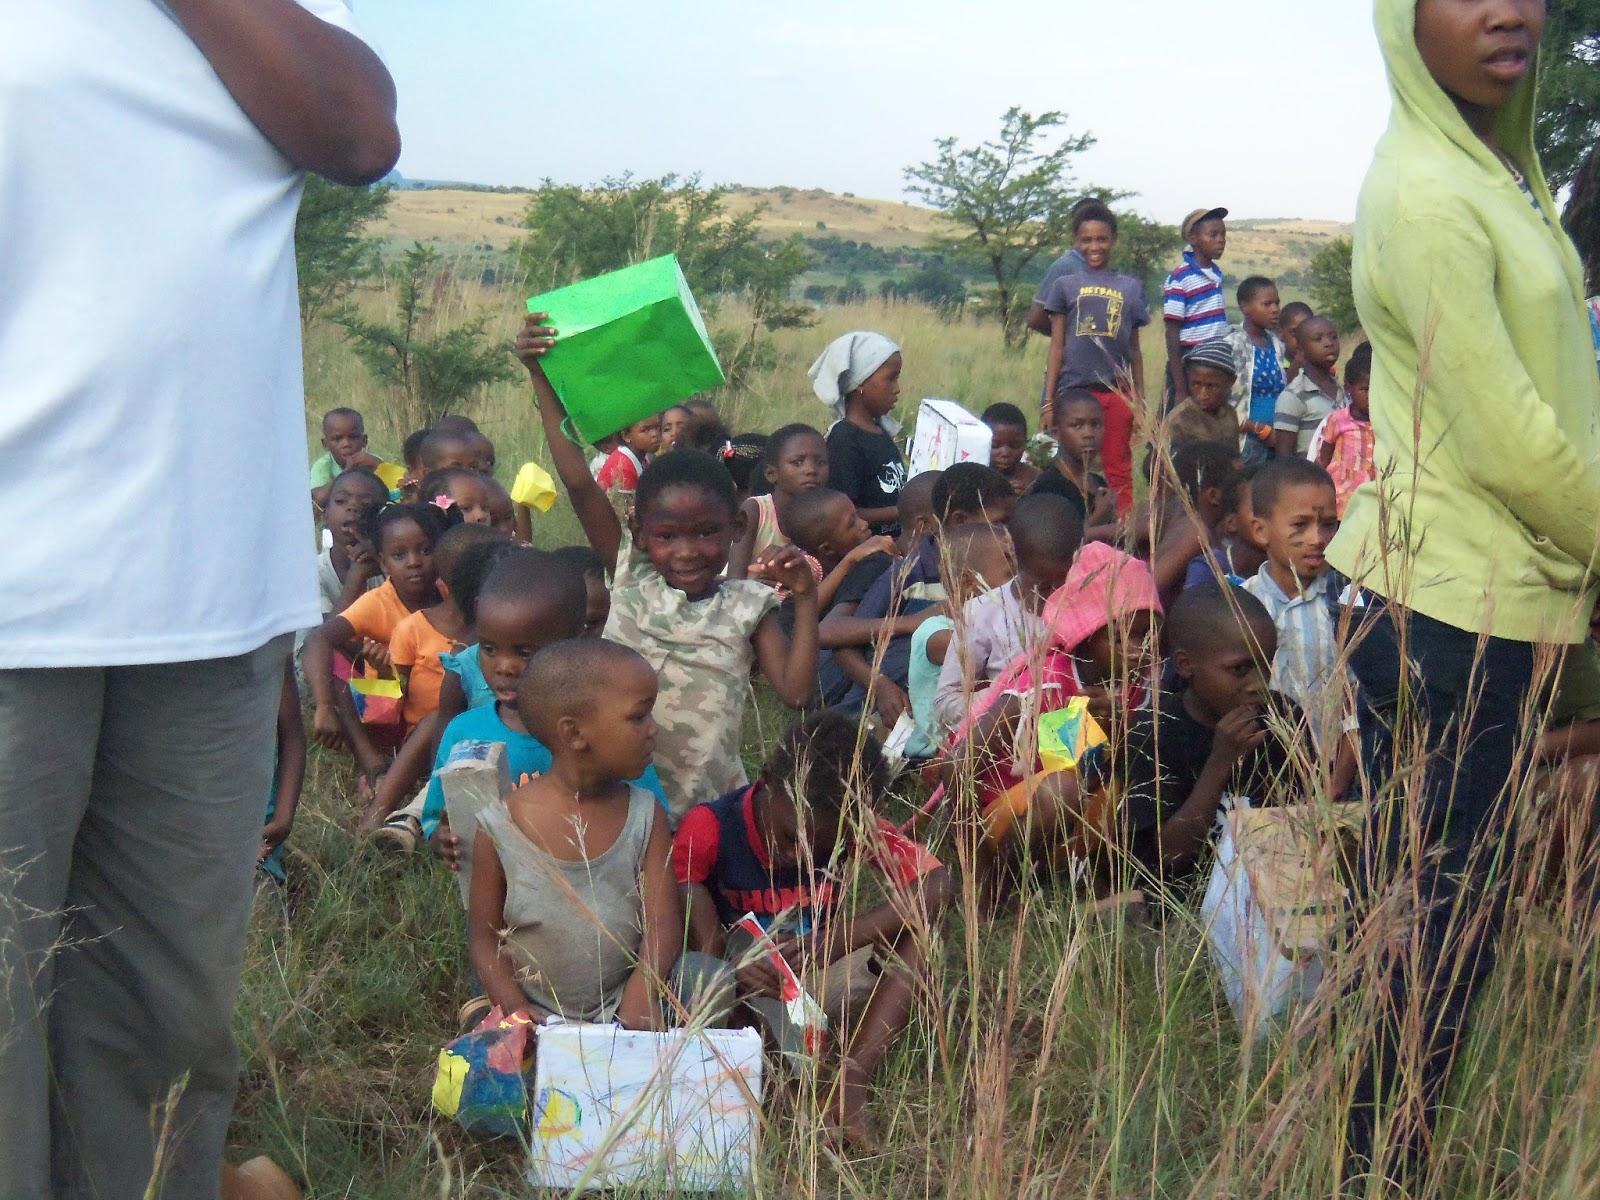 Escort girls in Botshabelo